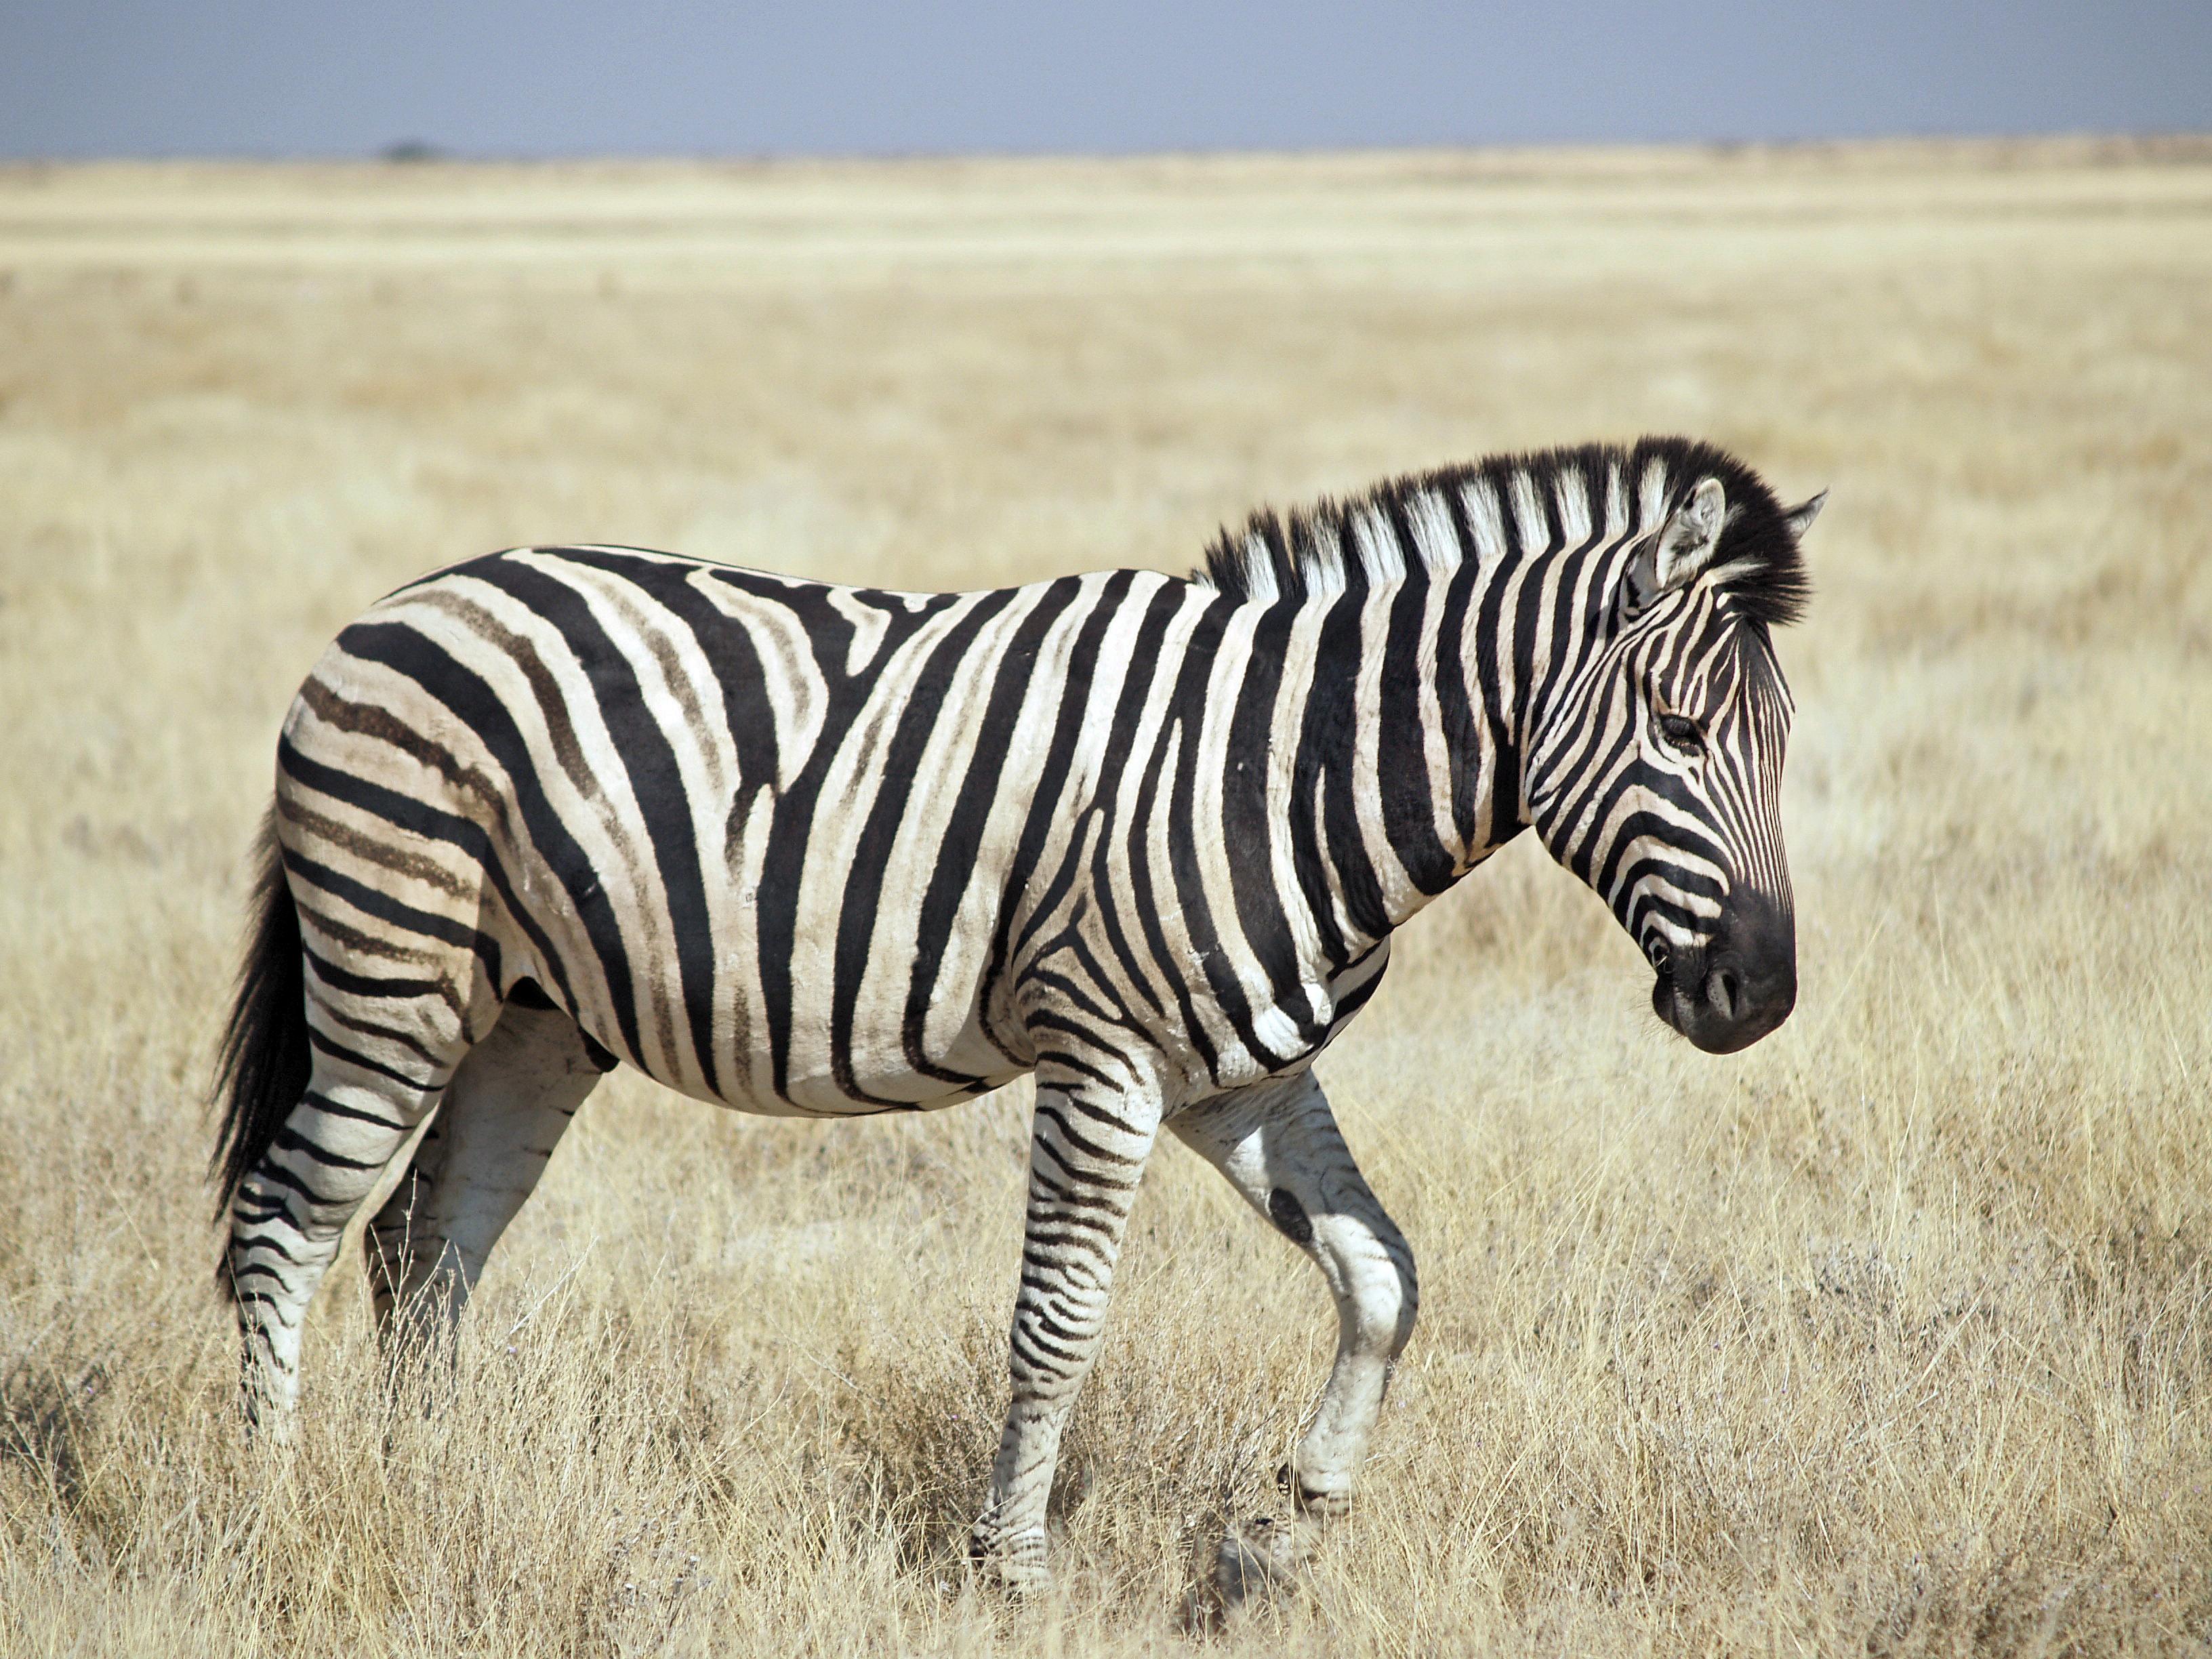 File:Burchell's Zebra (Etosha).jpg - Wikipedia